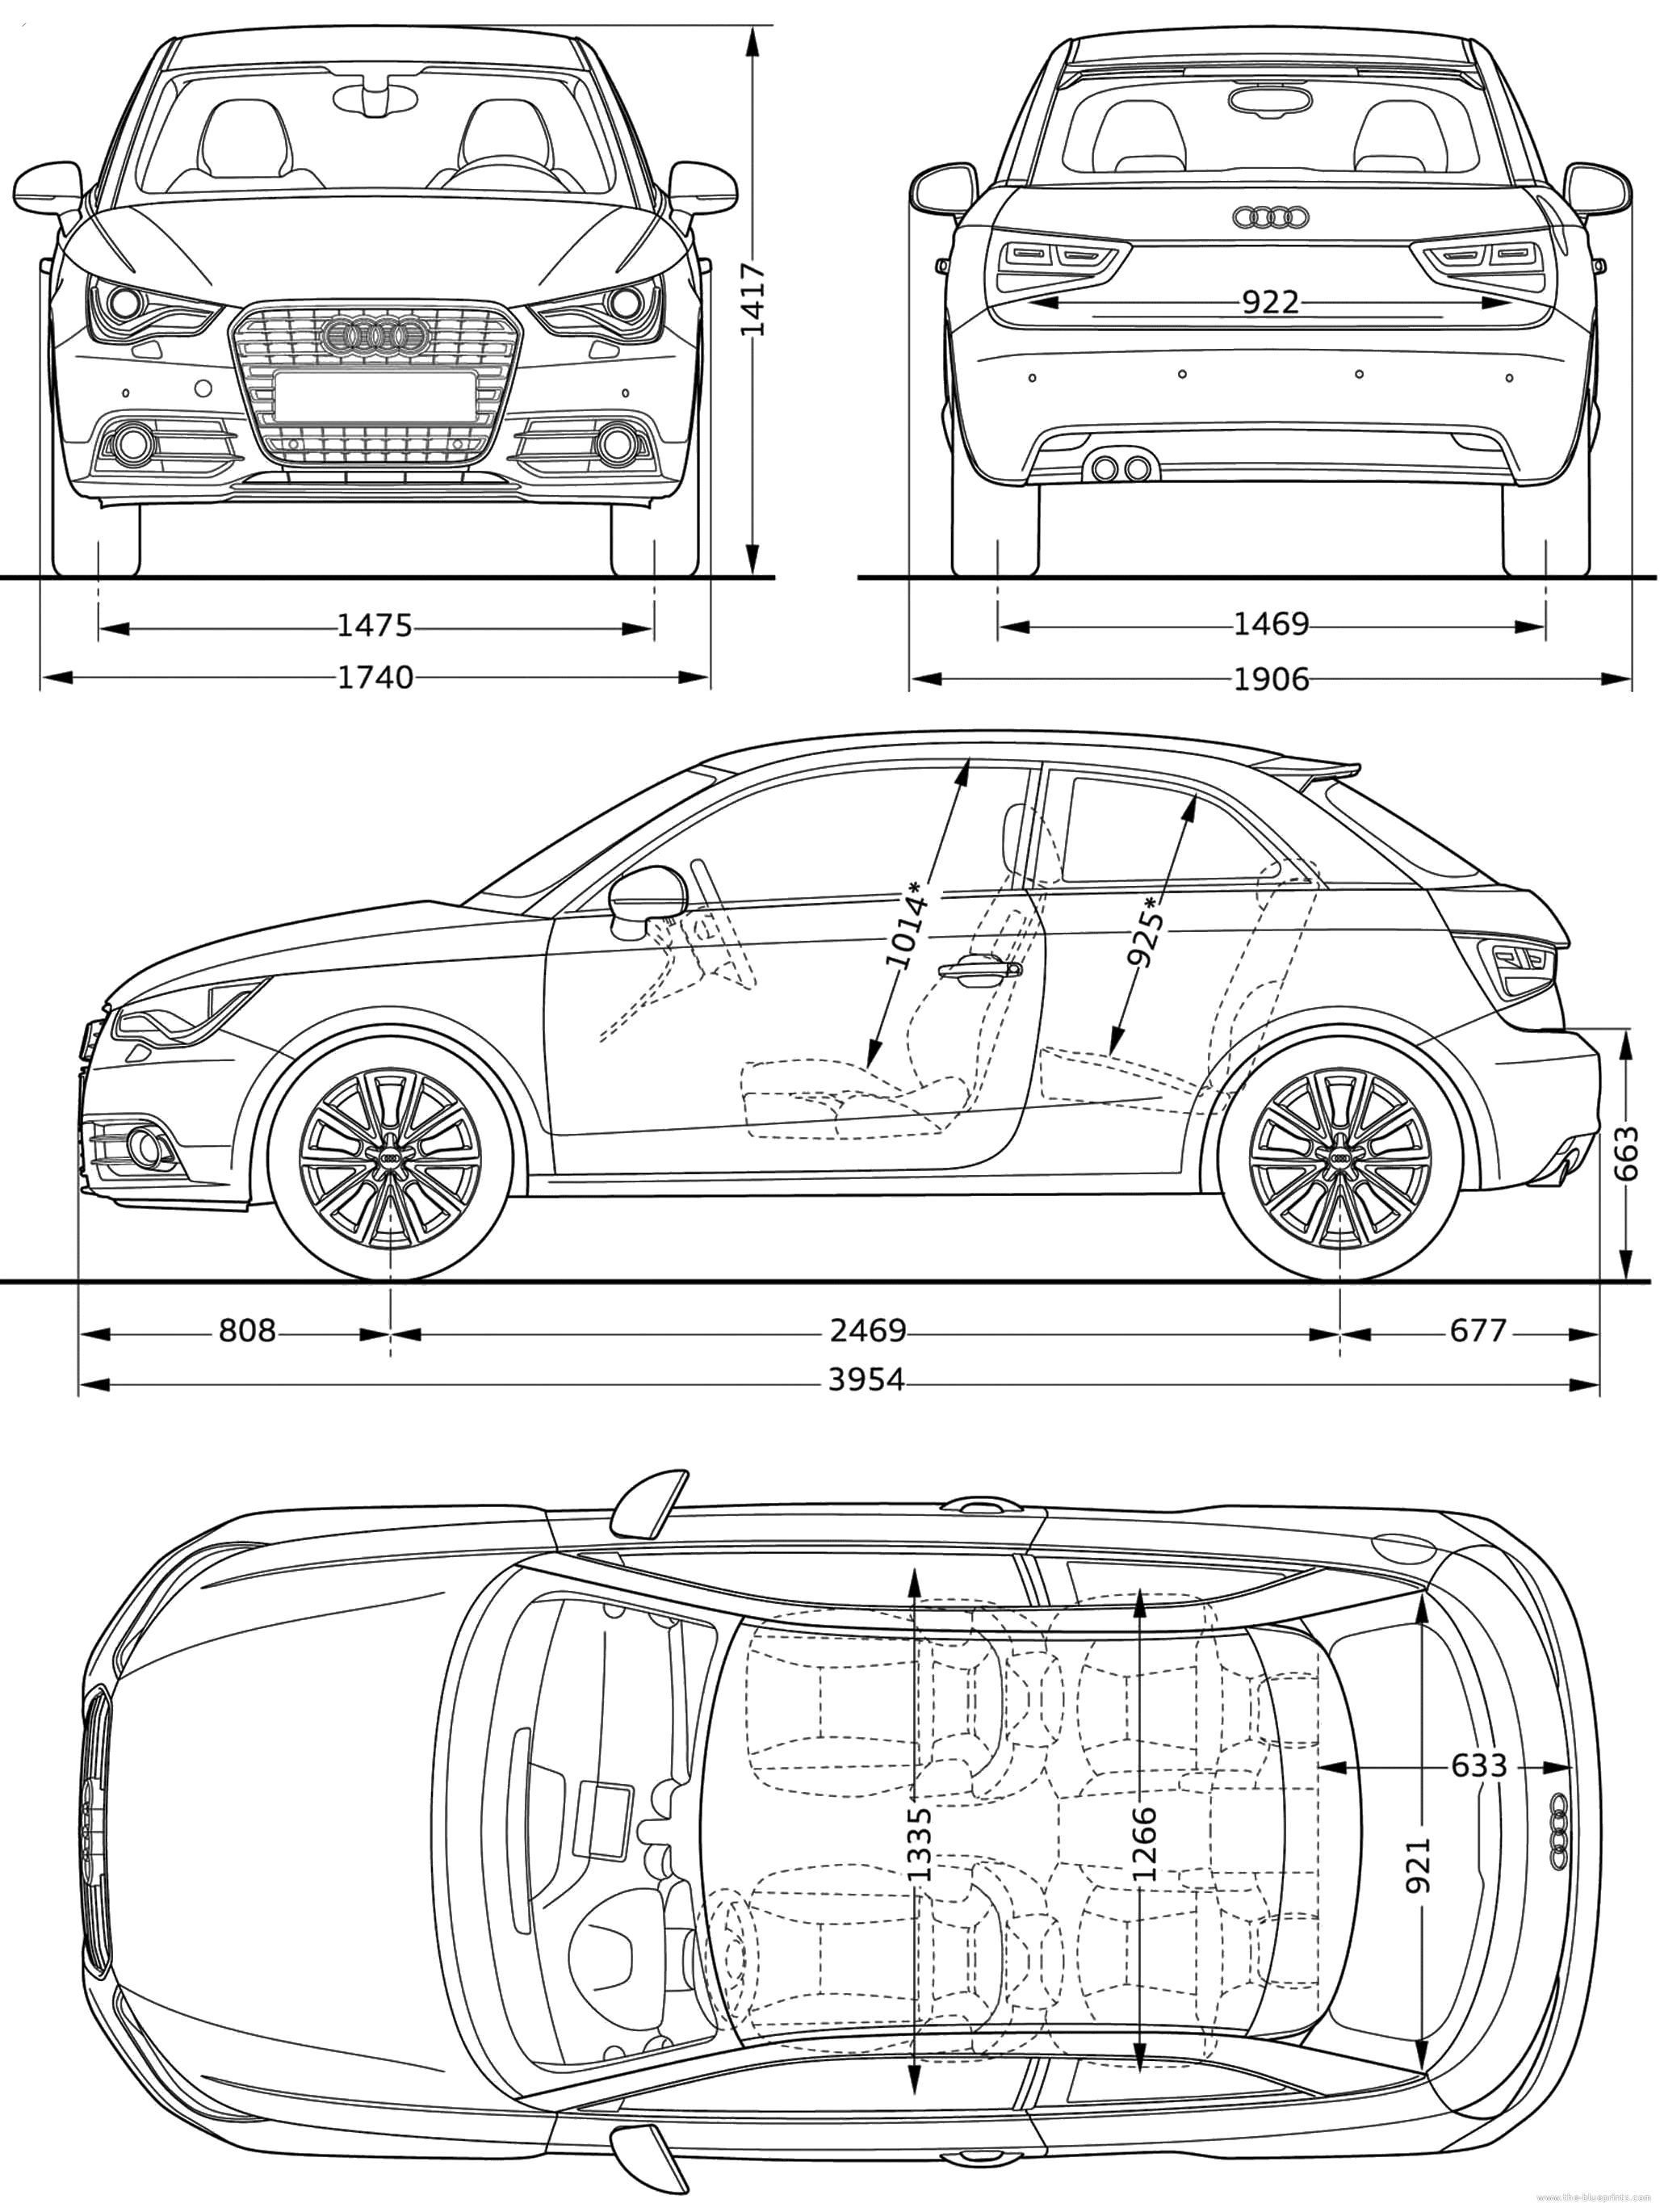 the blueprintscom blueprints cars audi a1 2010 pinterest voitures et dessin. Black Bedroom Furniture Sets. Home Design Ideas